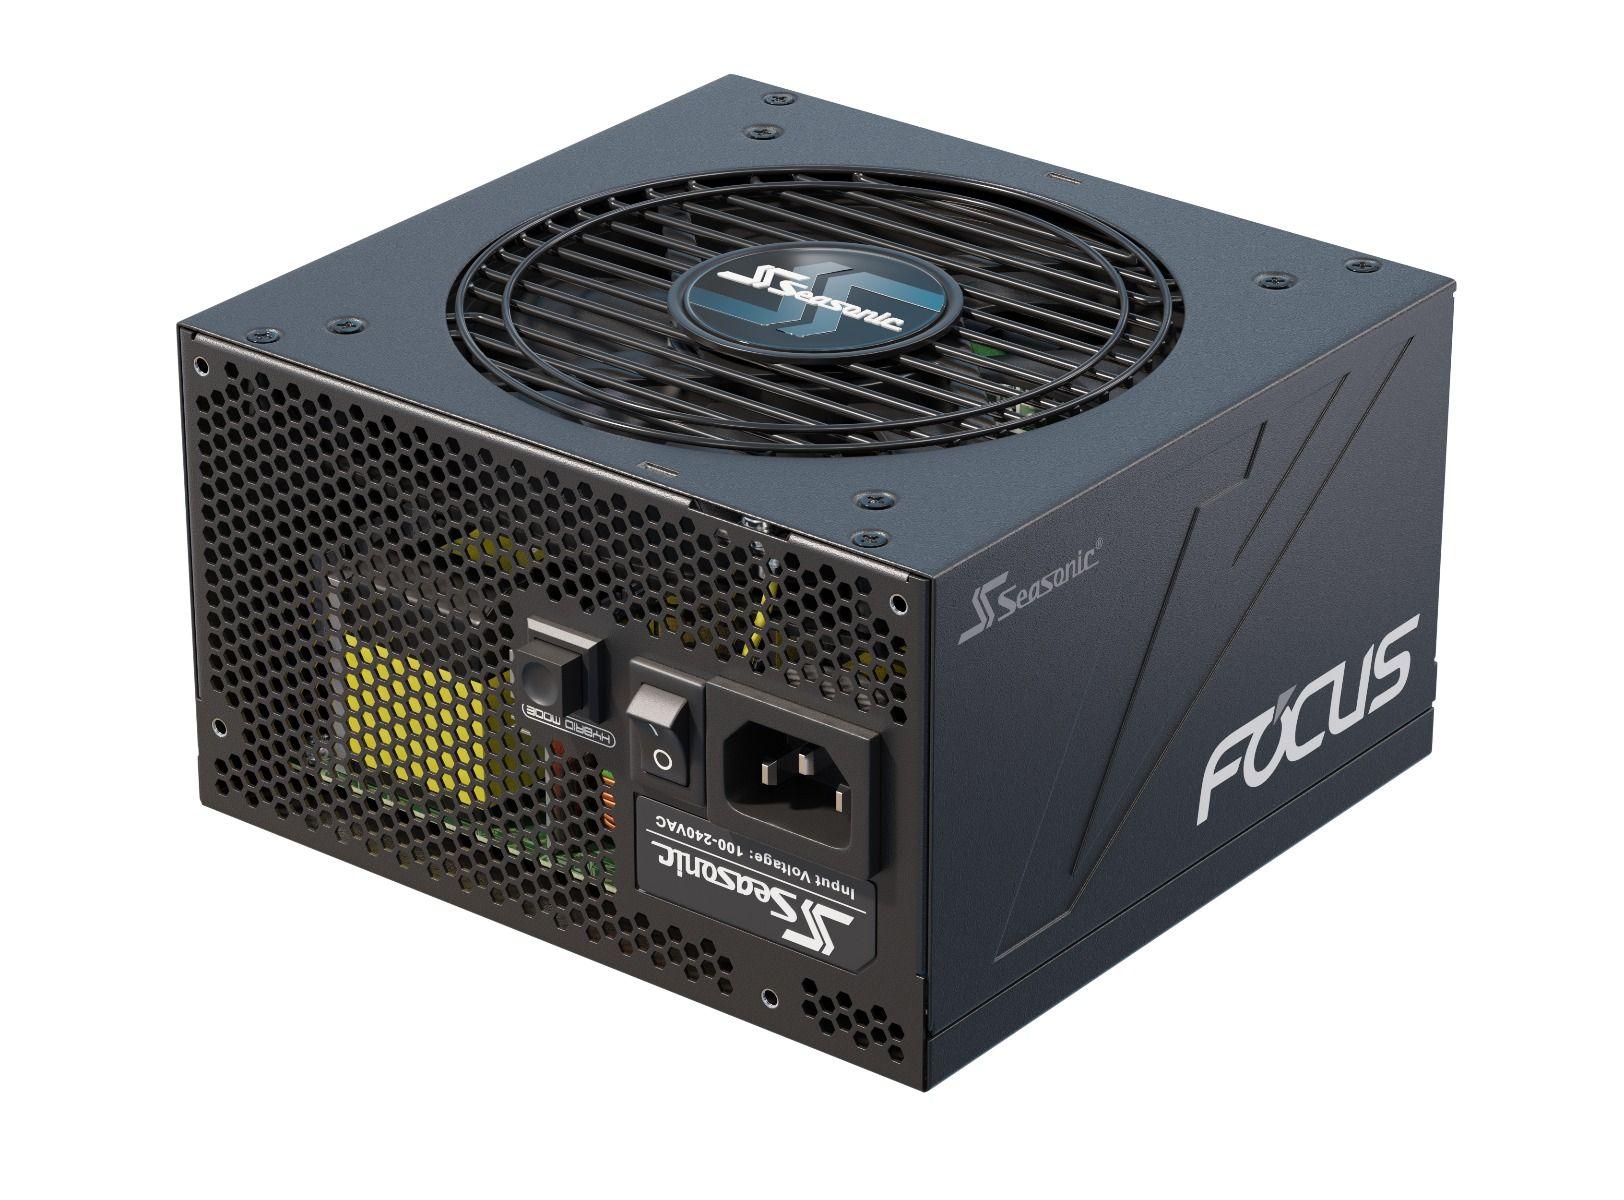 Sursa PC Seasonic Focus GX-550 Modulara 550W